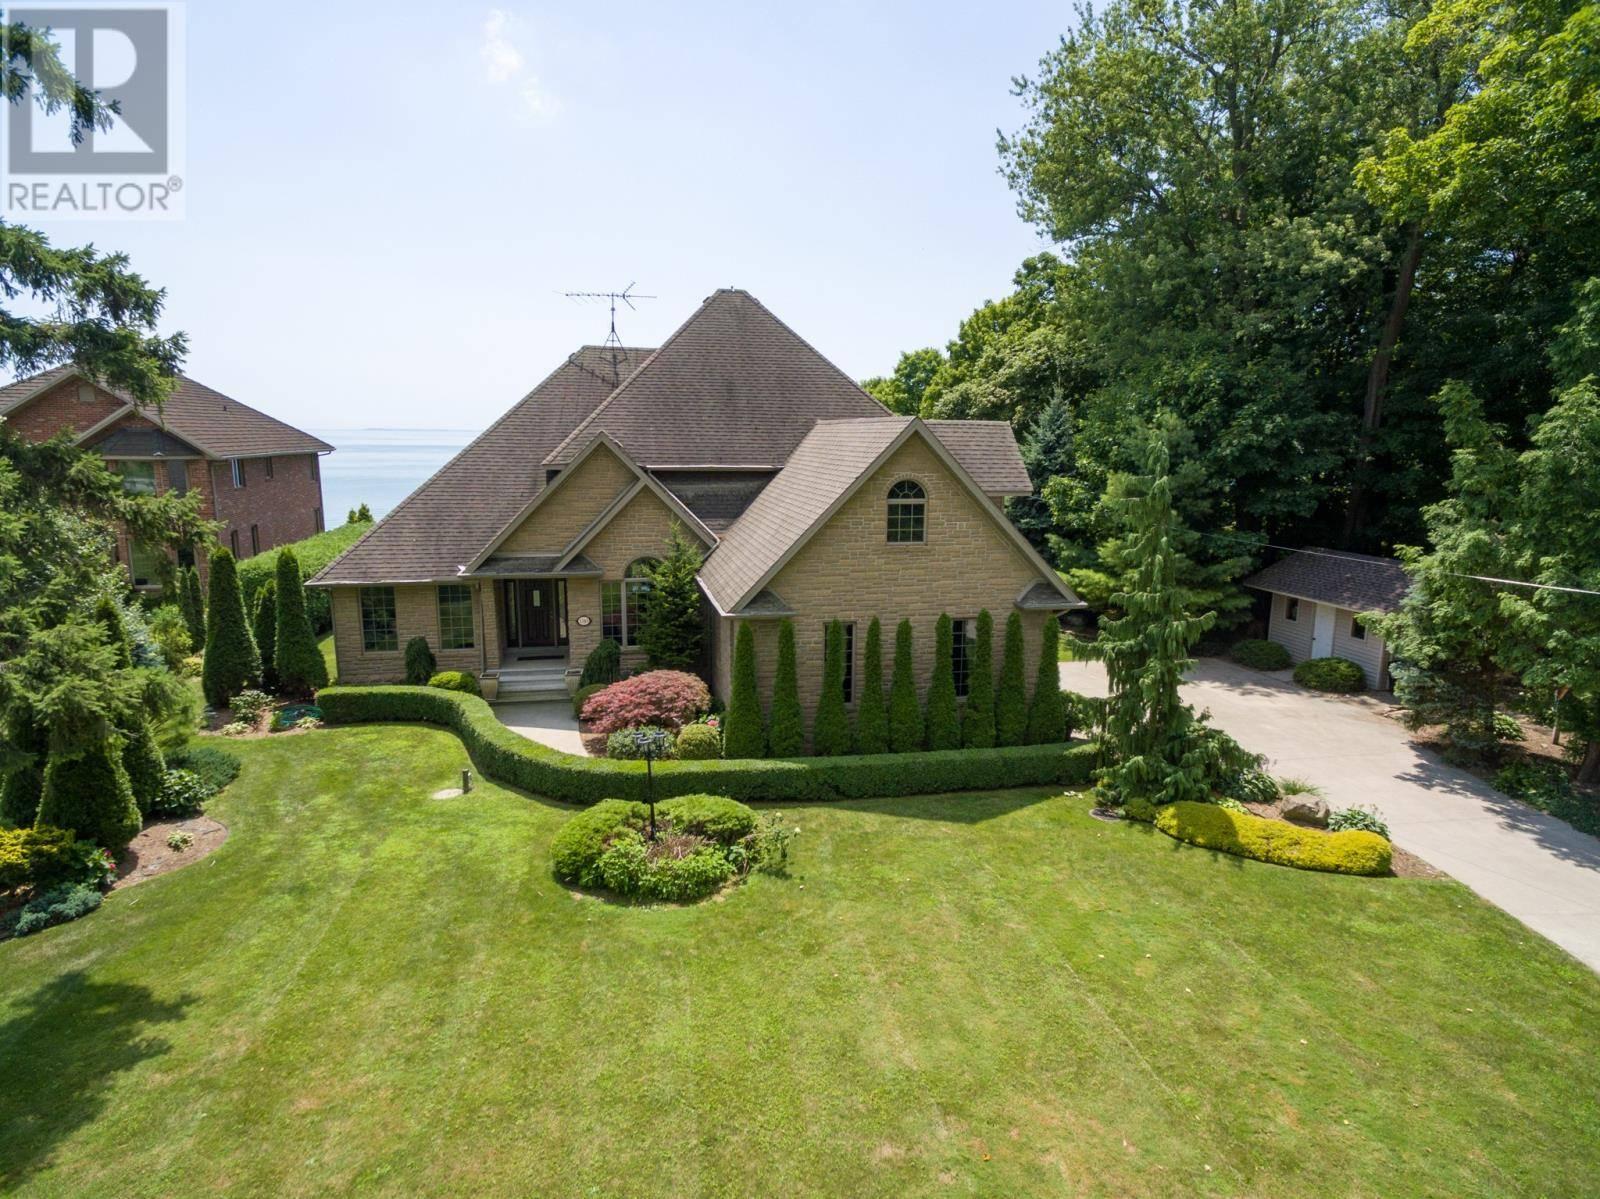 House for sale at 1343 Suncrest Rd Kingsville Ontario - MLS: 19022722